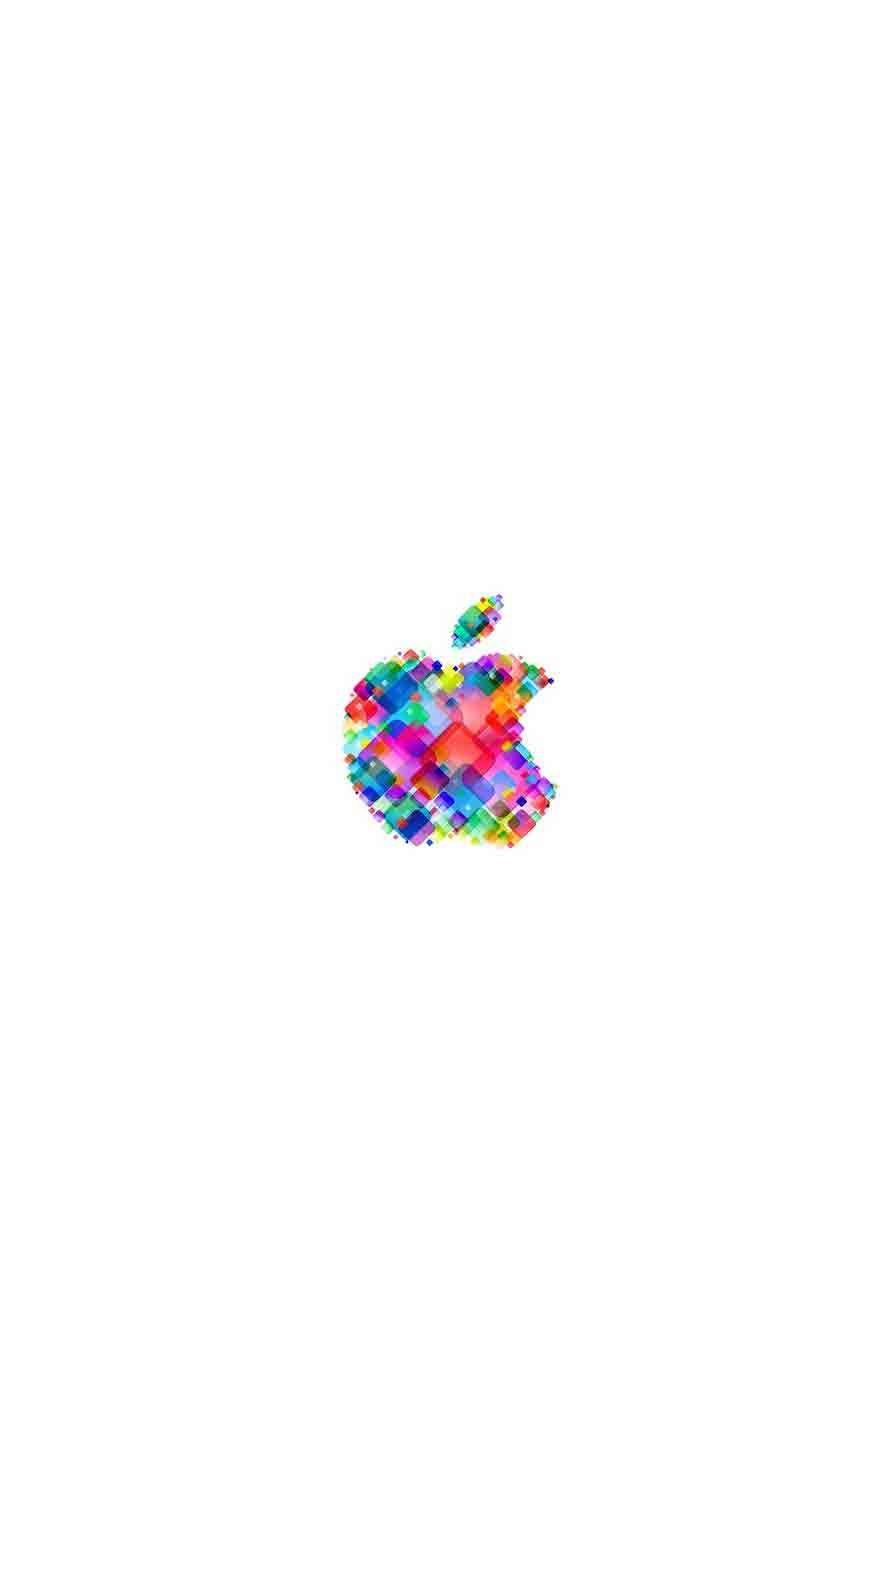 Iphone 6s Wallpaper White Logo Apple Fond D Ecran Blanc Objek Gambar Kertas Dinding Kertas Dinding Lucu